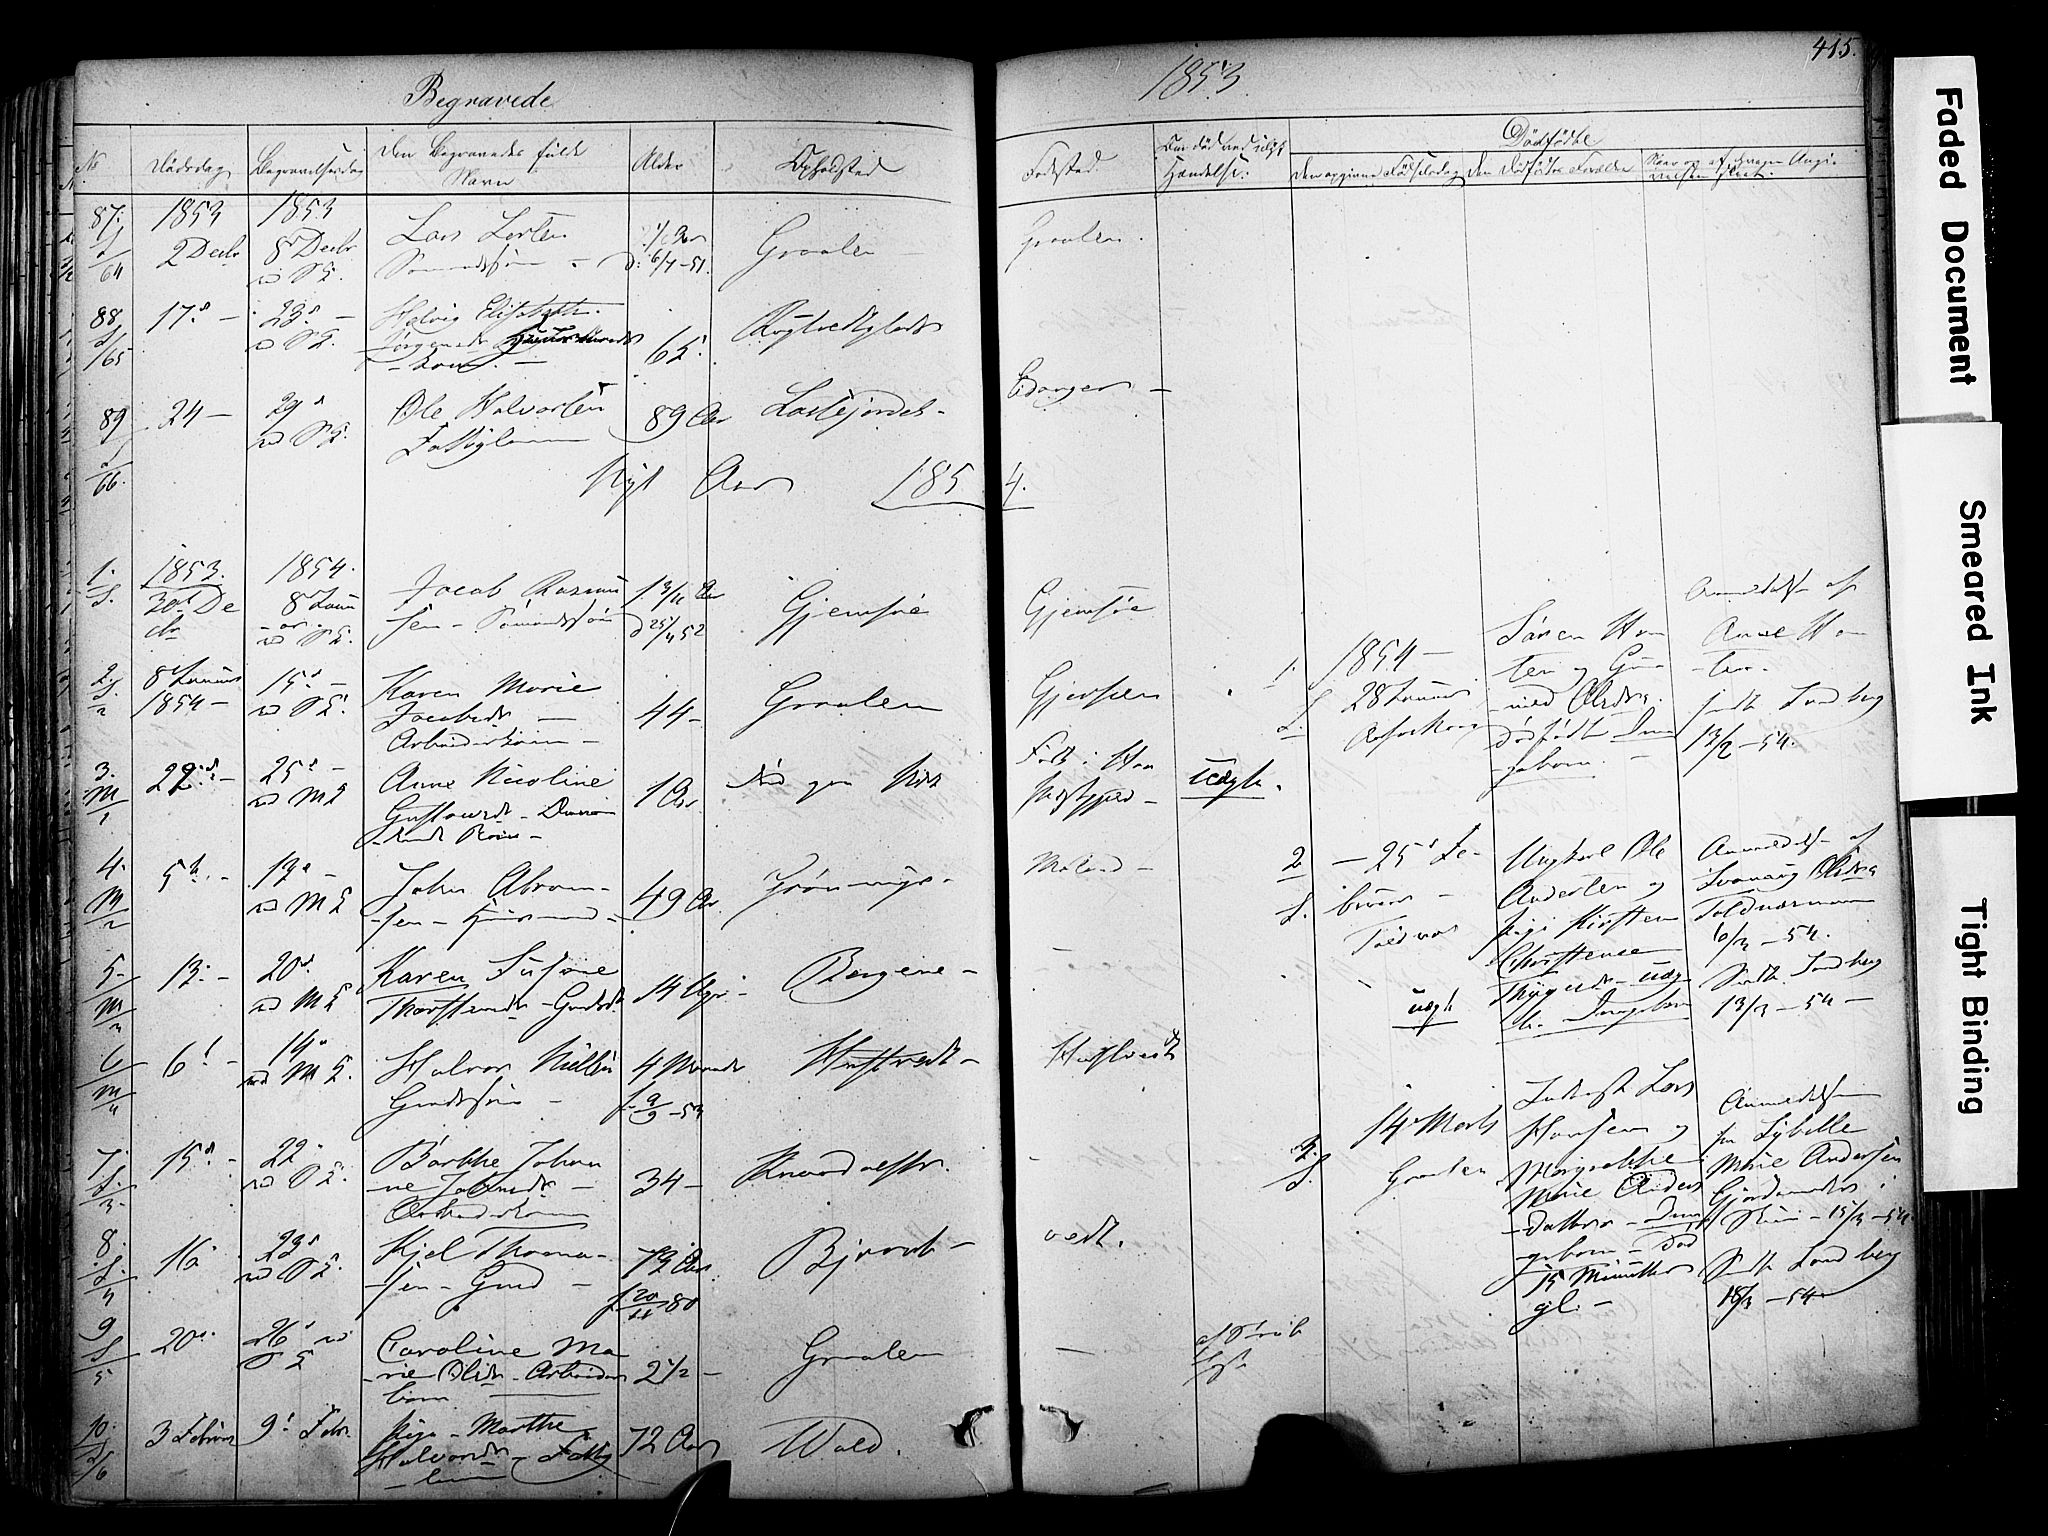 SAKO, Solum kirkebøker, F/Fa/L0006: Ministerialbok nr. I 6, 1844-1855, s. 415